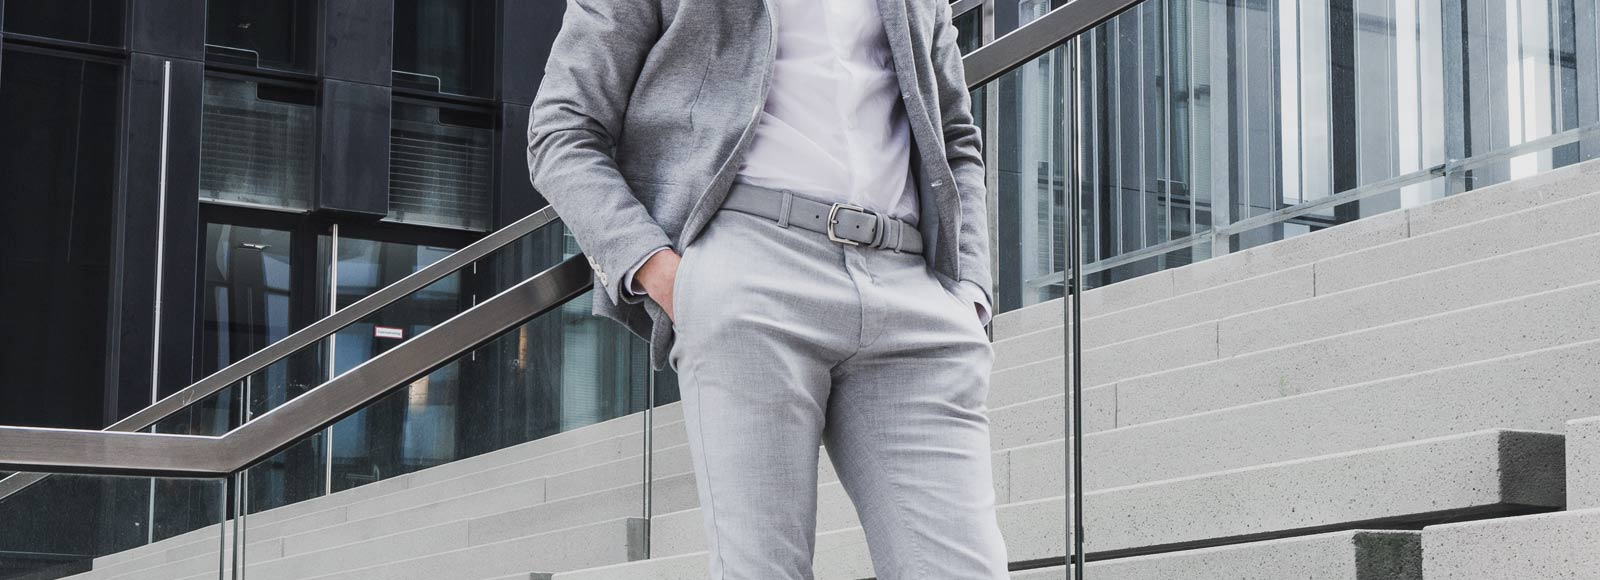 Grau Gürtel Richtig Stylen